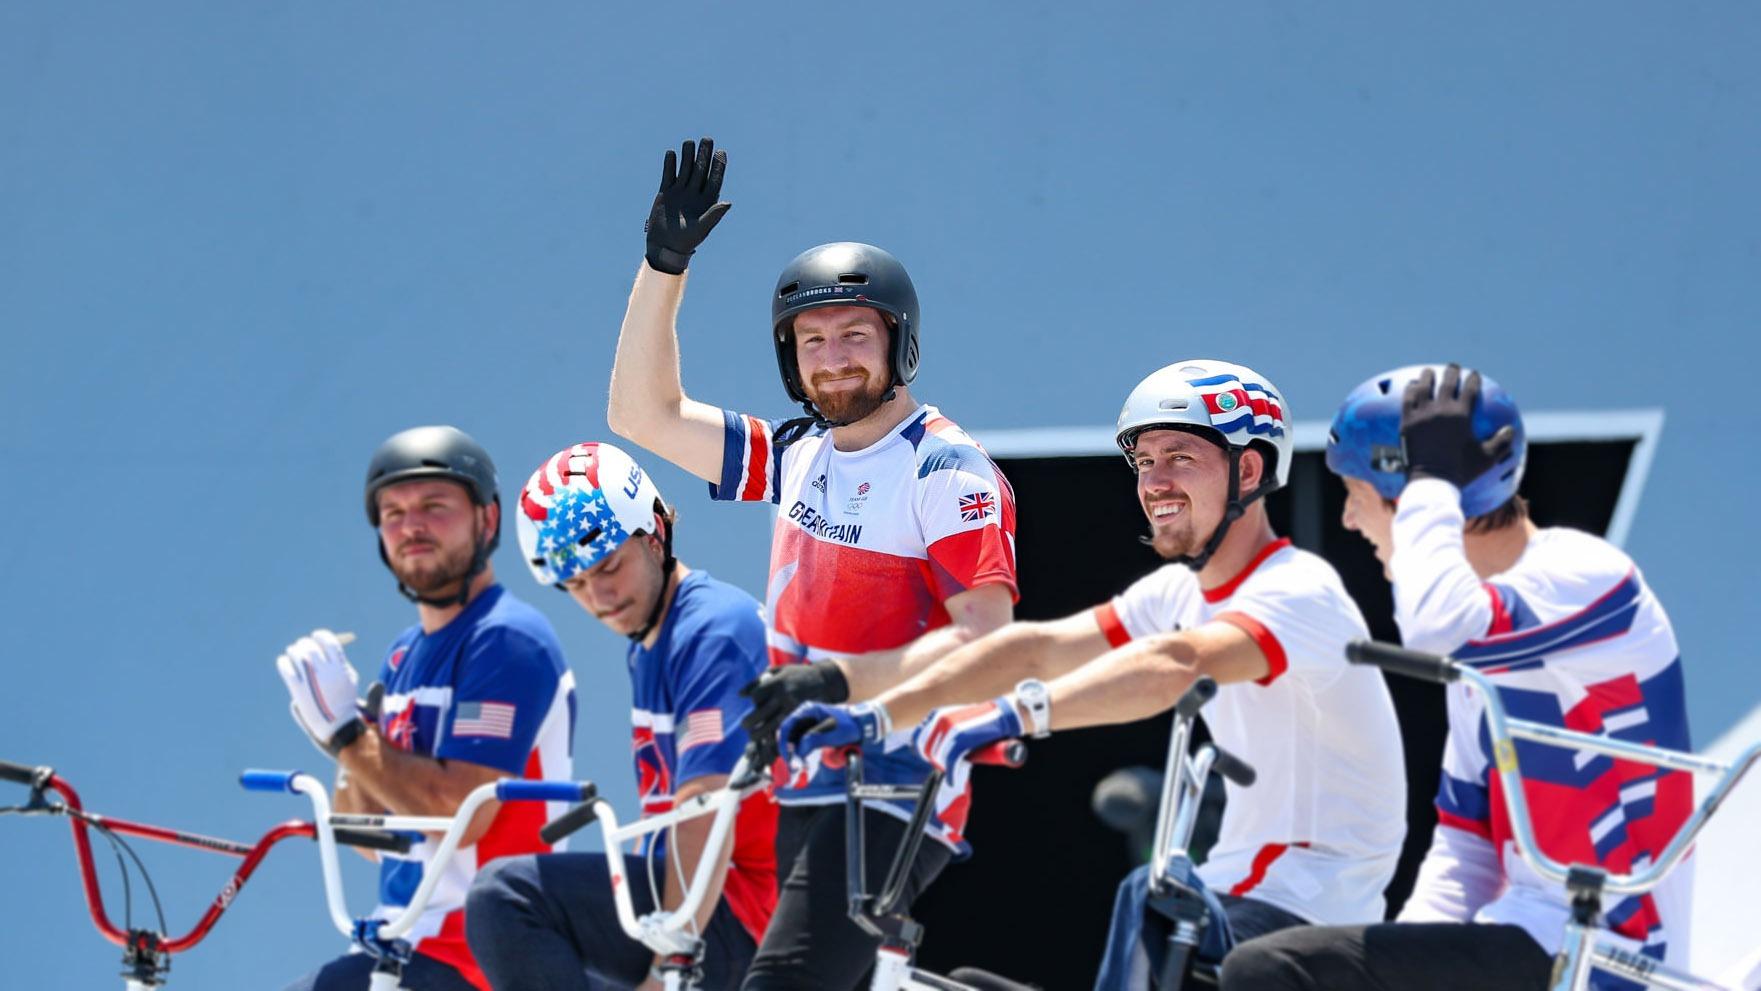 DECLAN BROOKS: Reflecting on Olympic BMX Bronze